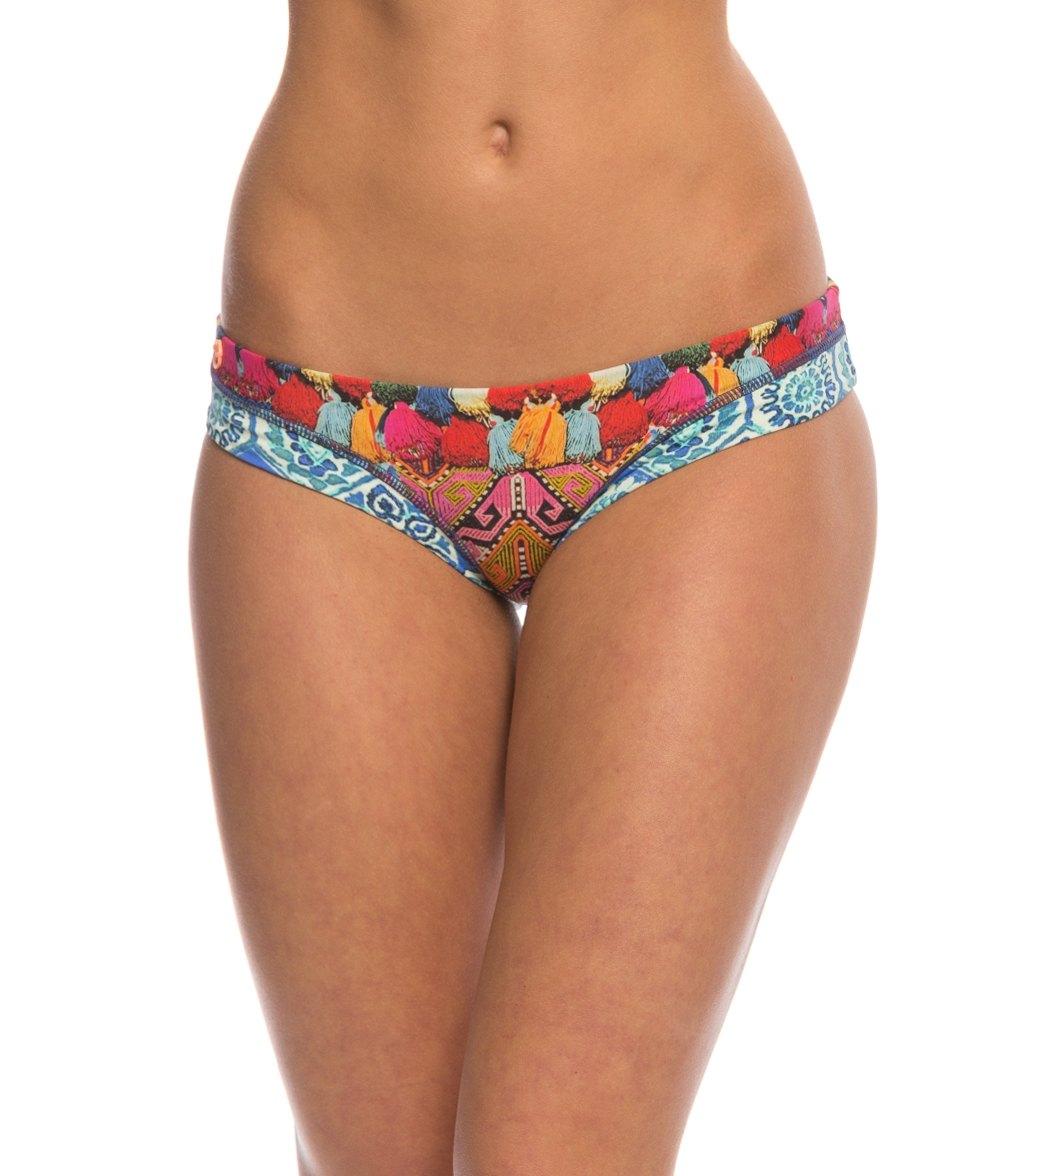 Maaji Tassels And Tiles Signature Bikini Bottom At